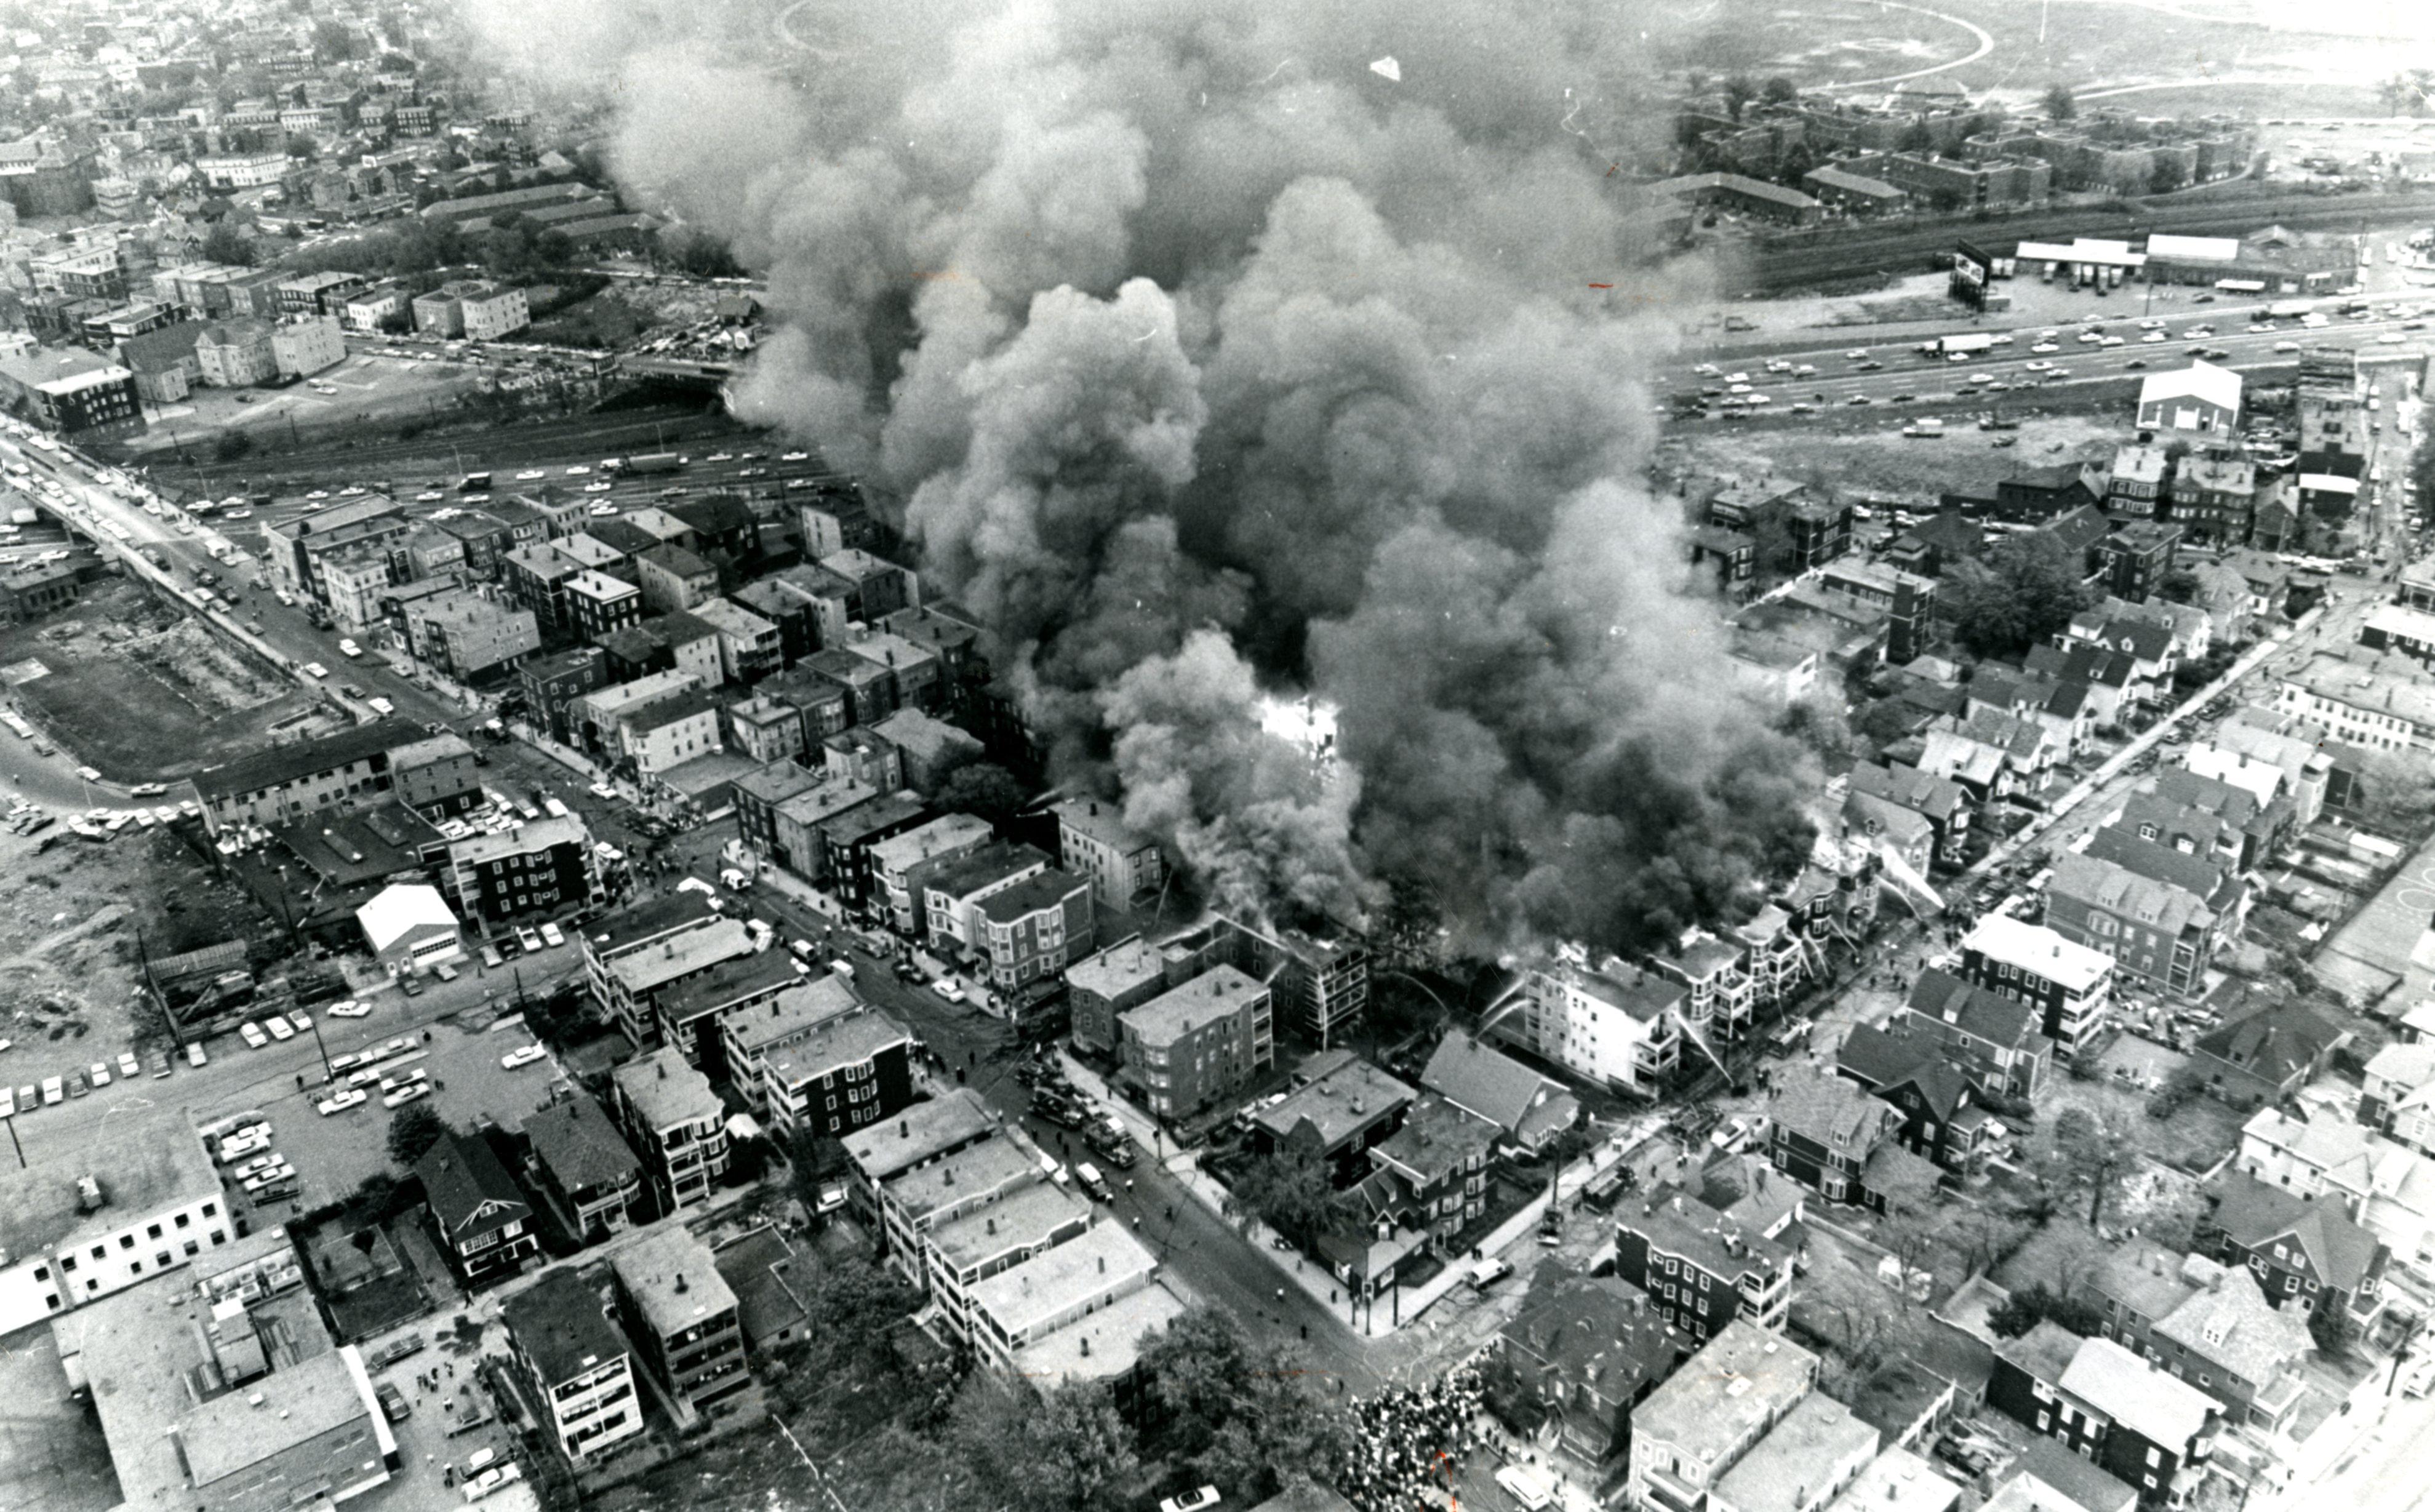 Devastating 1964 Dorchester fire recalled - The Boston Globe